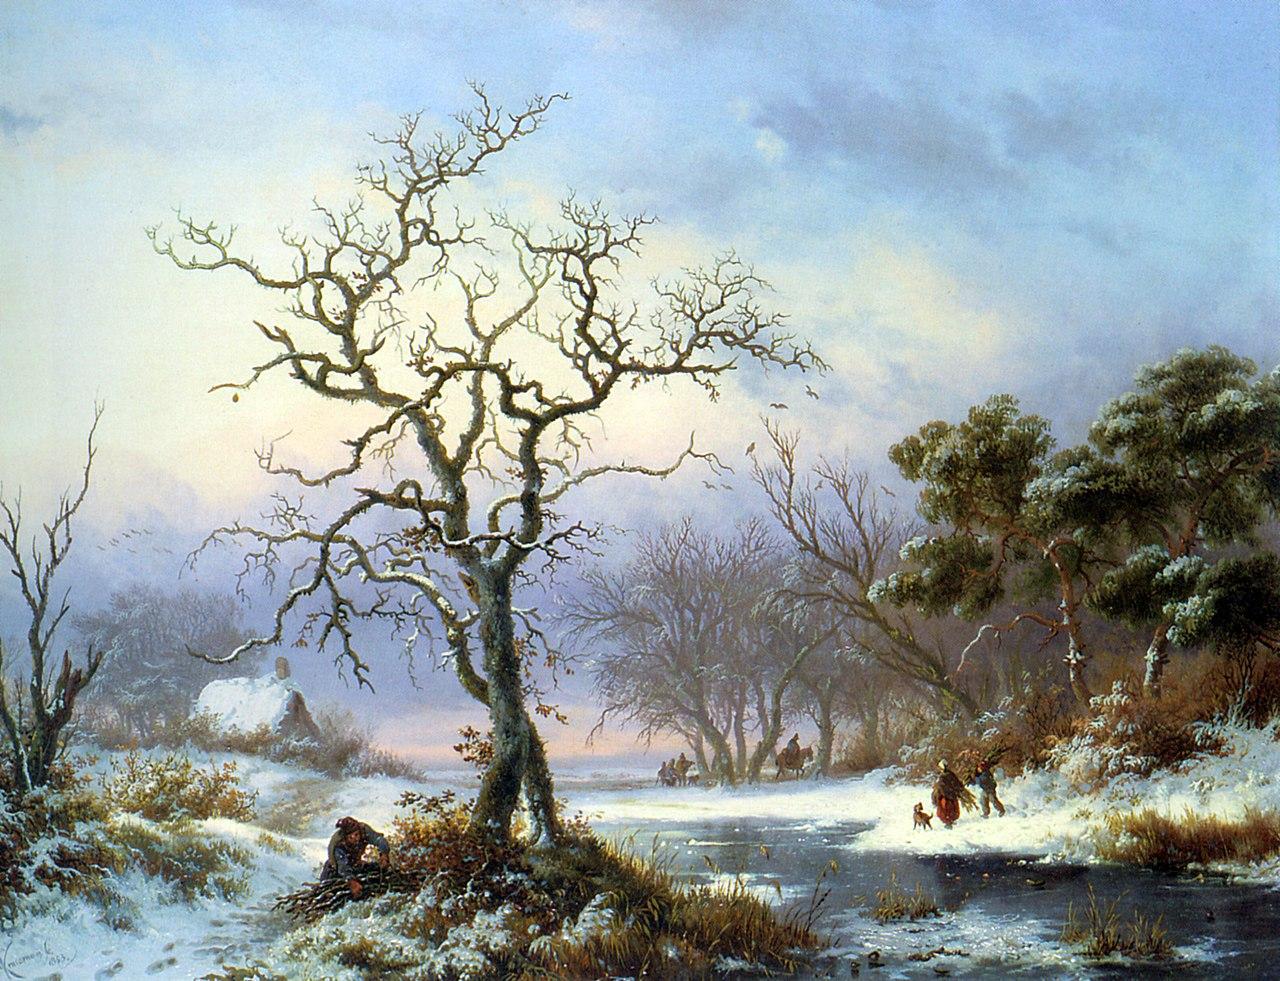 https://upload.wikimedia.org/wikipedia/commons/thumb/9/9d/Kruseman_Fredrik_Marinus_Faggot_Gatherers_in_a_Winter_Landscape_1853_Oil_On_Panel.jpg/1280px-Kruseman_Fredrik_Marinus_Faggot_Gatherers_in_a_Winter_Landscape_1853_Oil_On_Panel.jpg